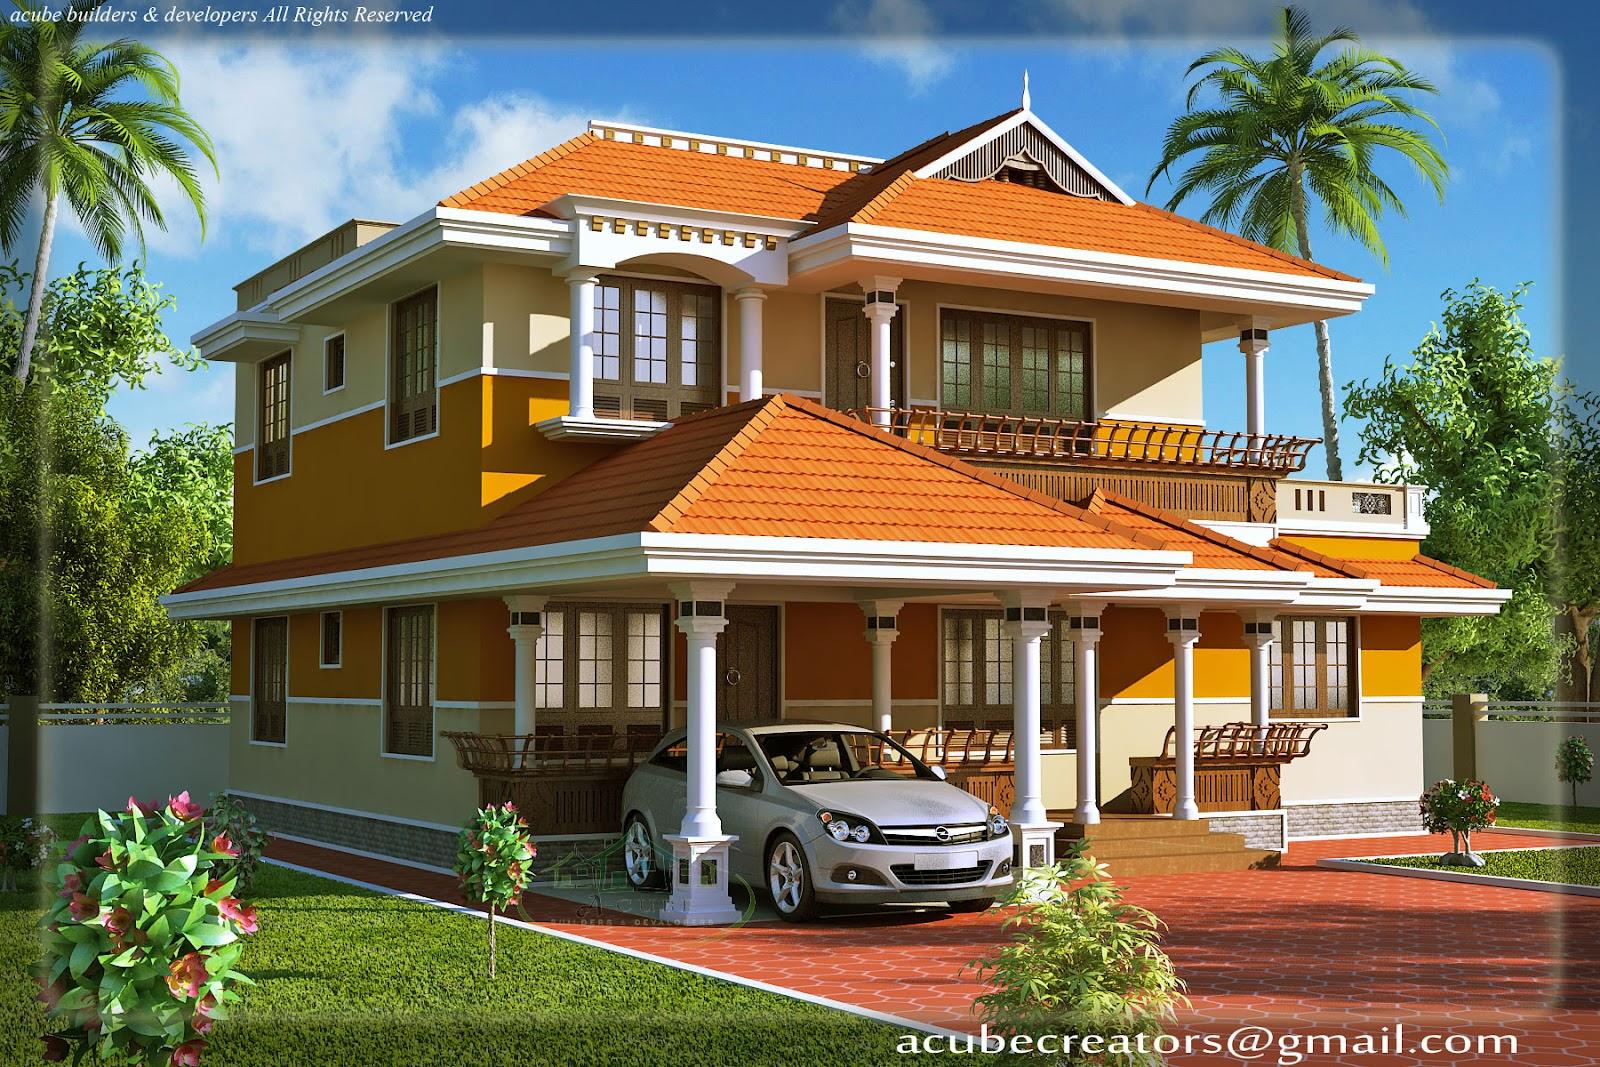 Keralahousedesigns acube builders developers elevation for Home designs kerala plans